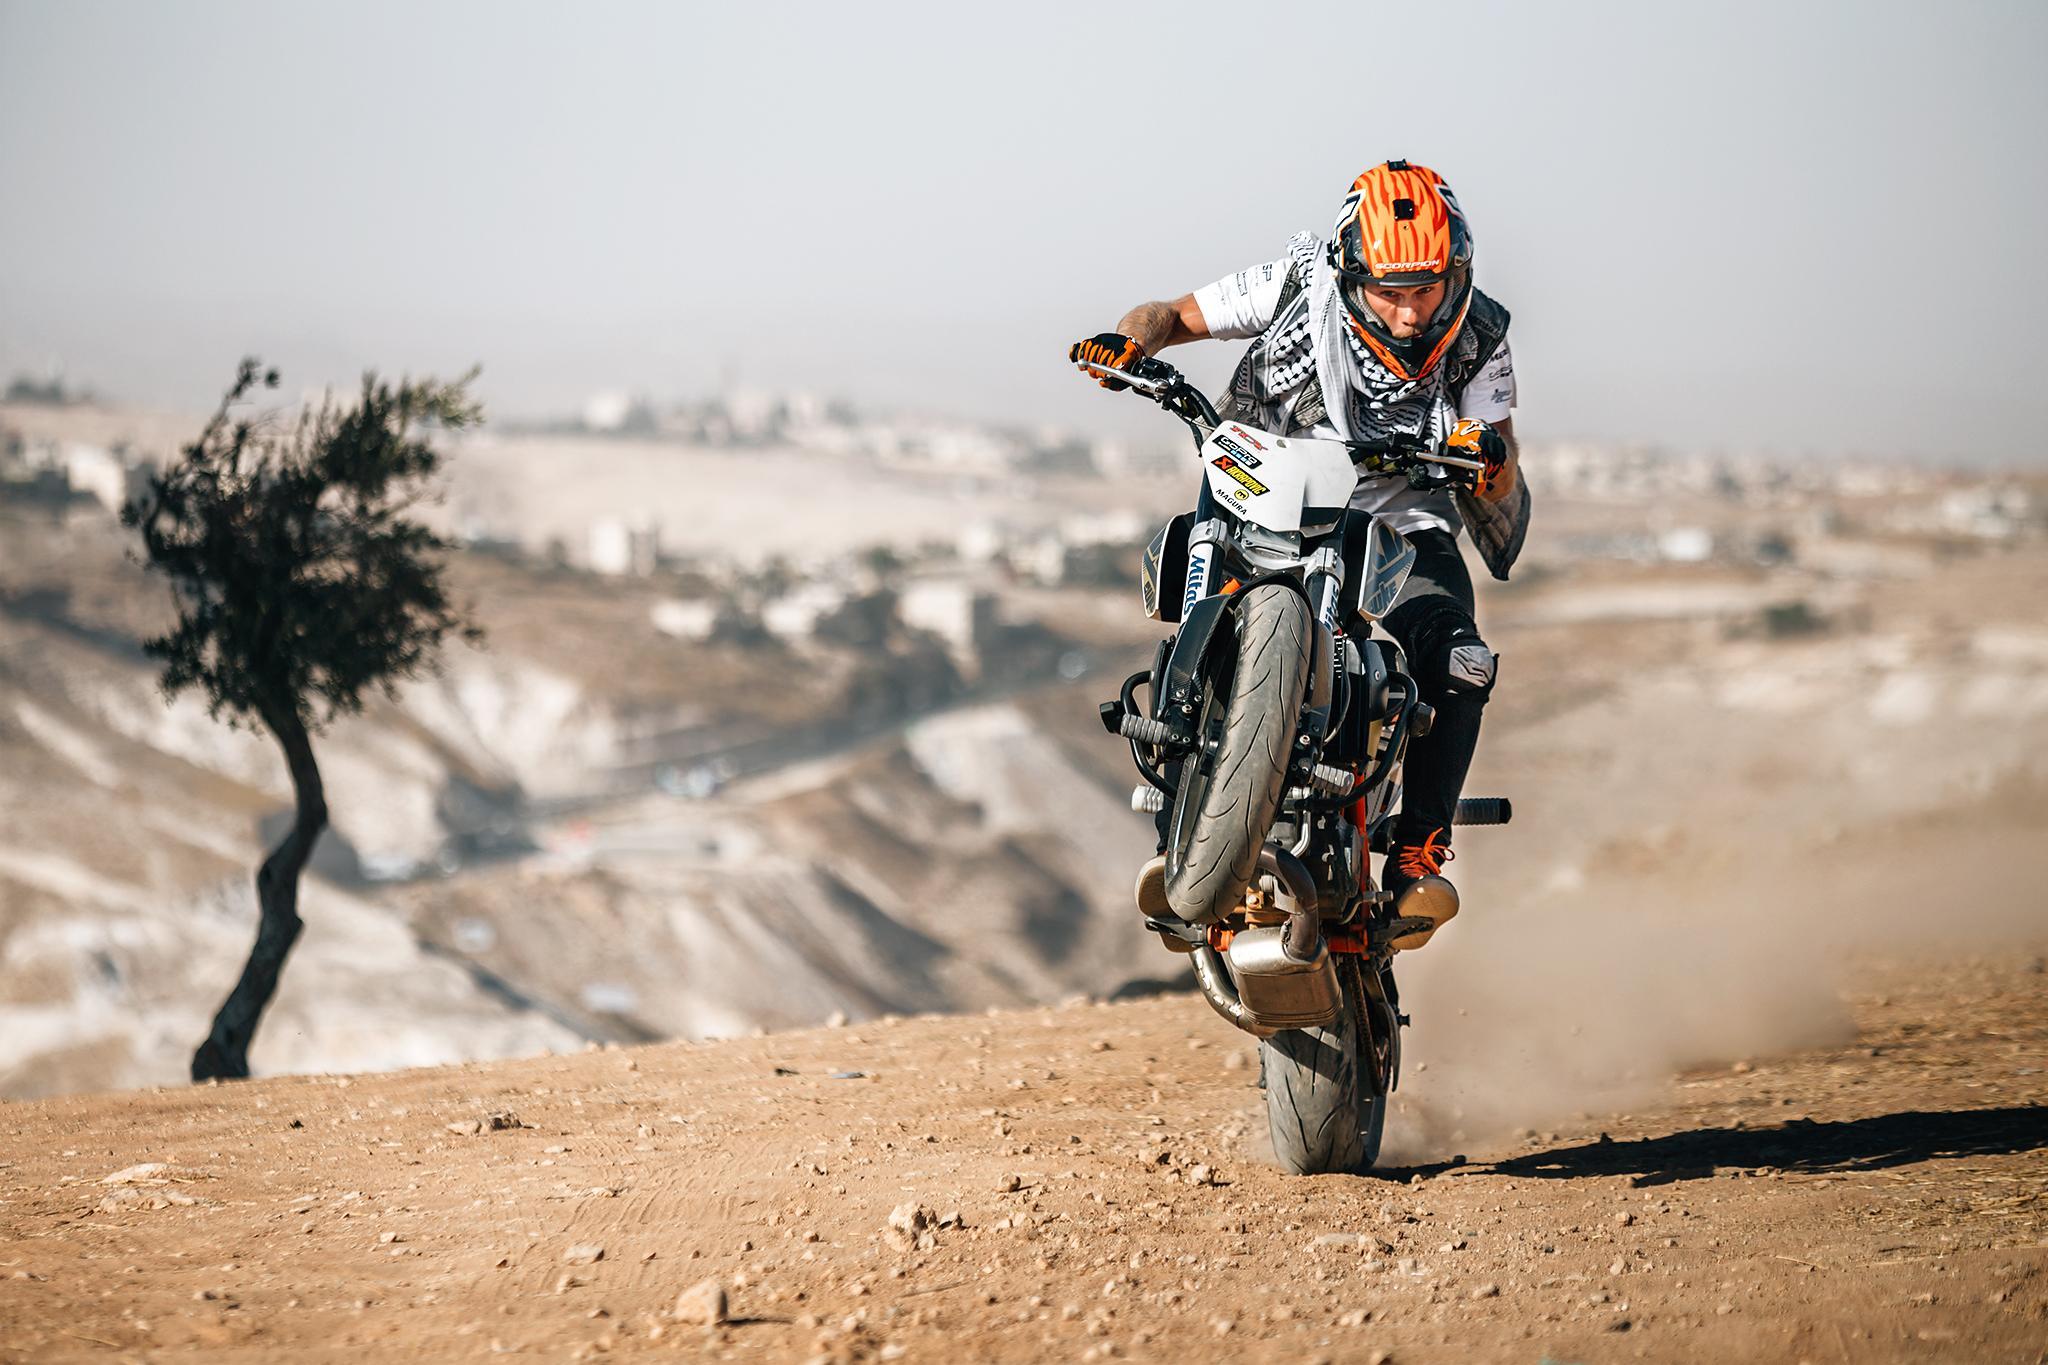 KTM Duke Stunt Rider Rok Bagoros Performed in Palestine Foto